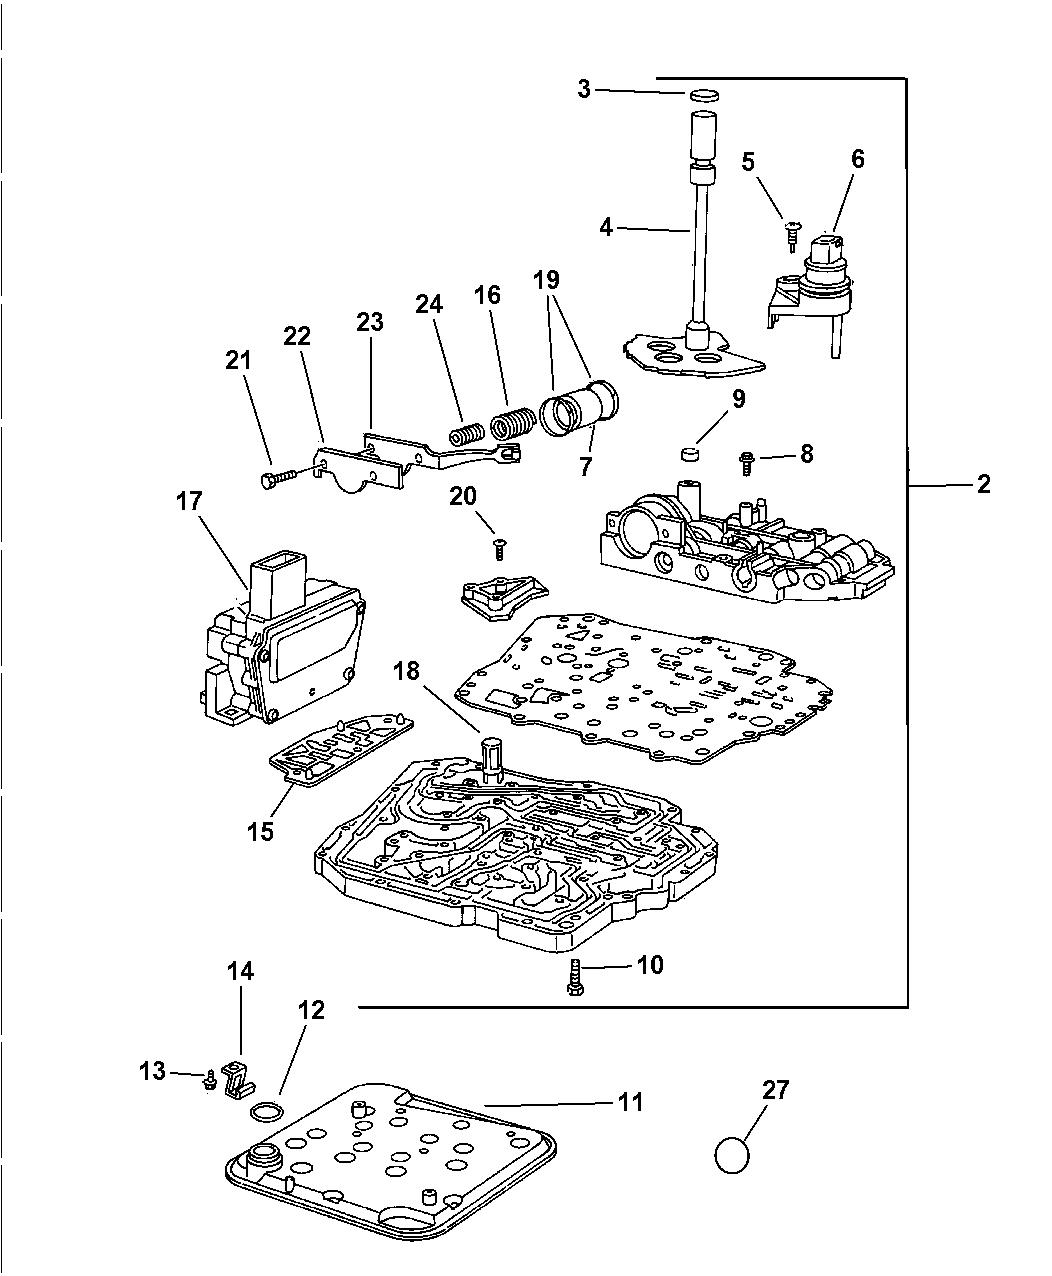 2003 Chrysler Concorde Fuse Diagram